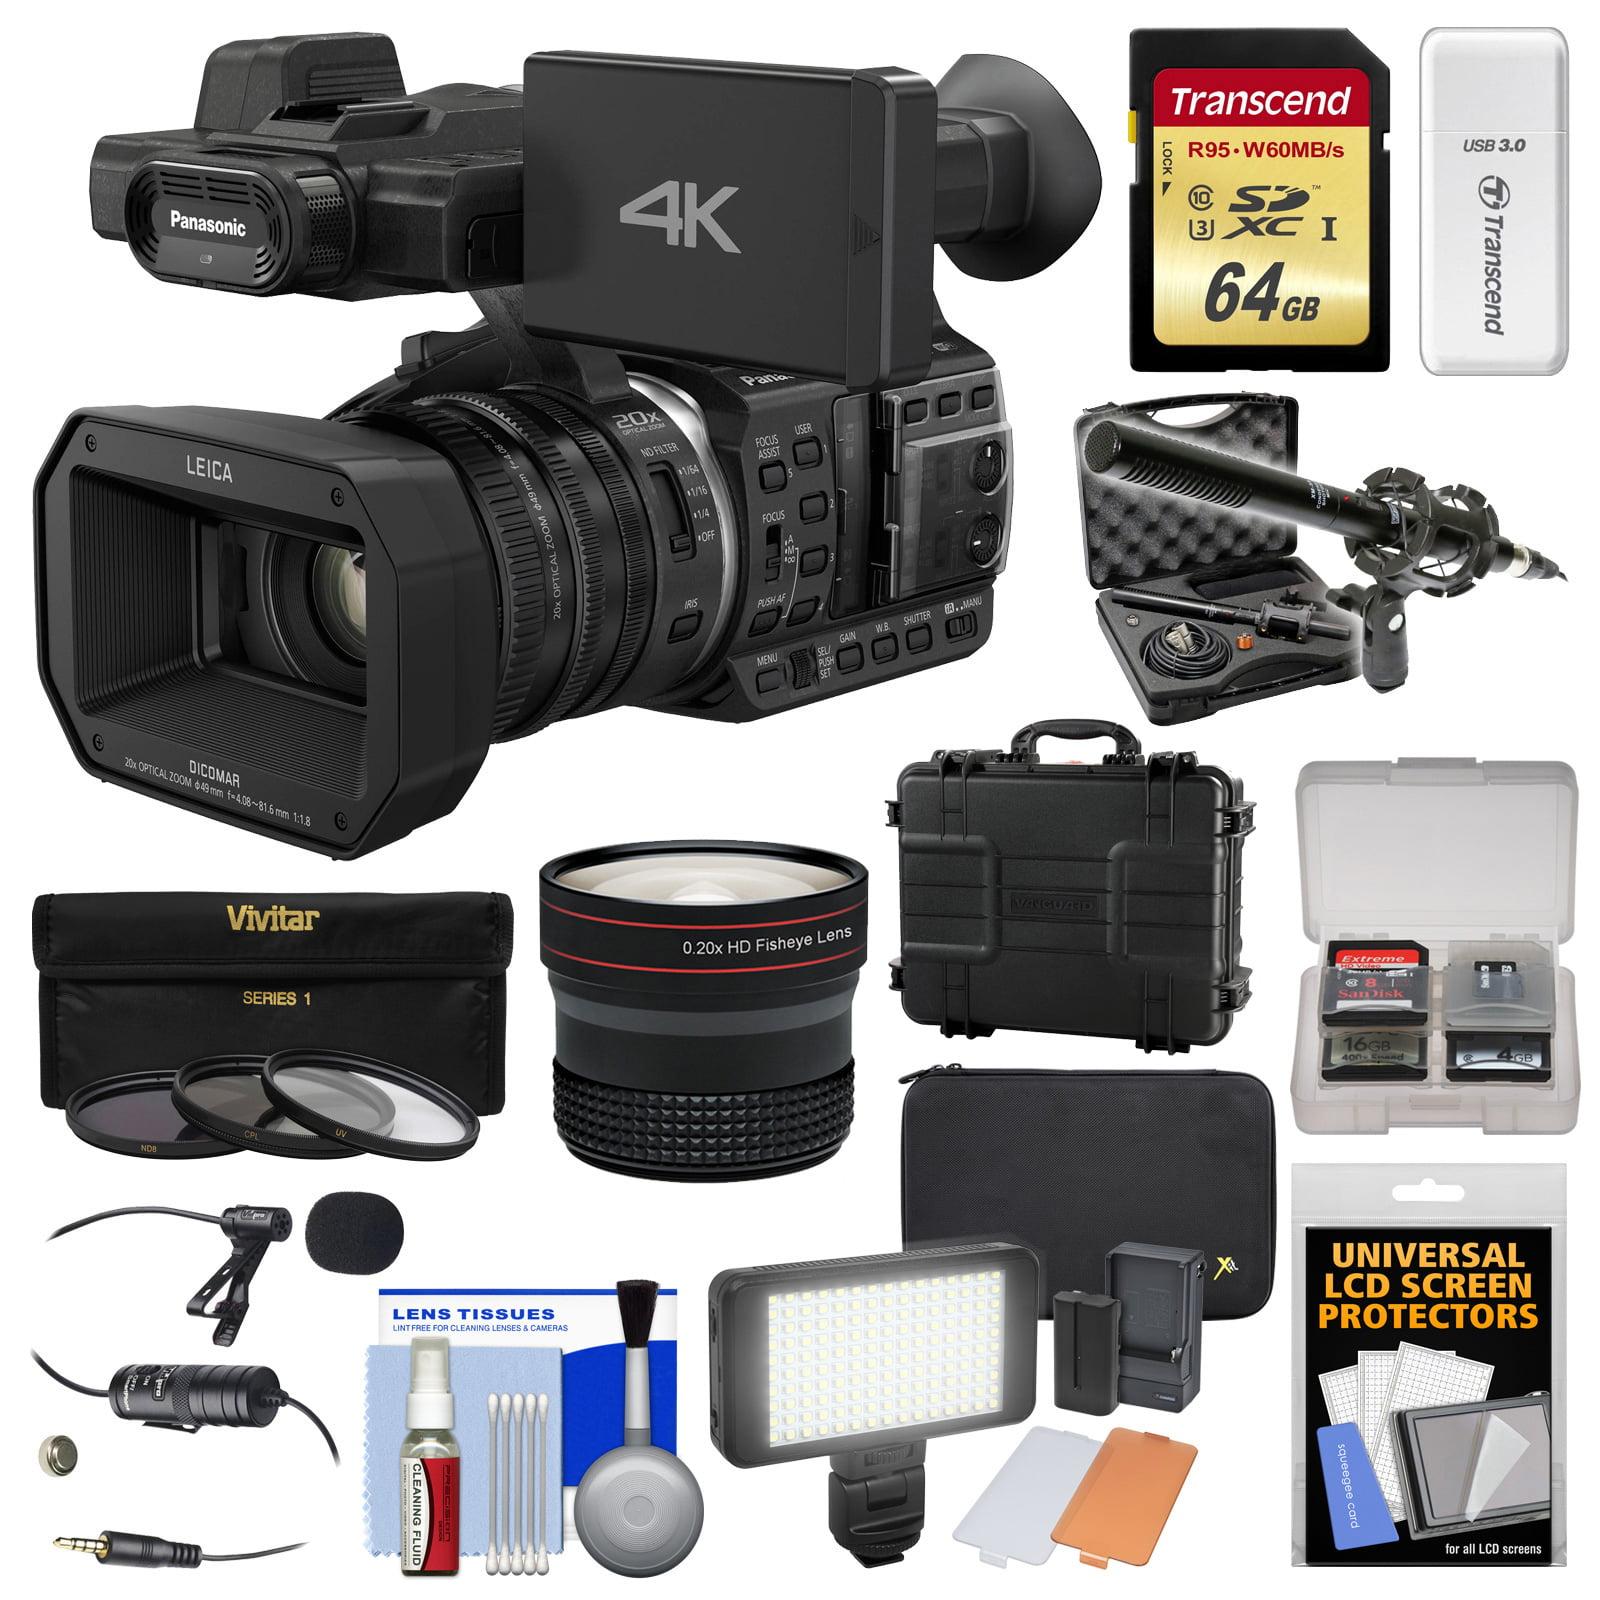 Panasonic HC-X1000 4K Ultra HD Wi-Fi Video Camera Camcorder with Fisheye Lens + 64GB Card + Waterproof Case +... by Panasonic